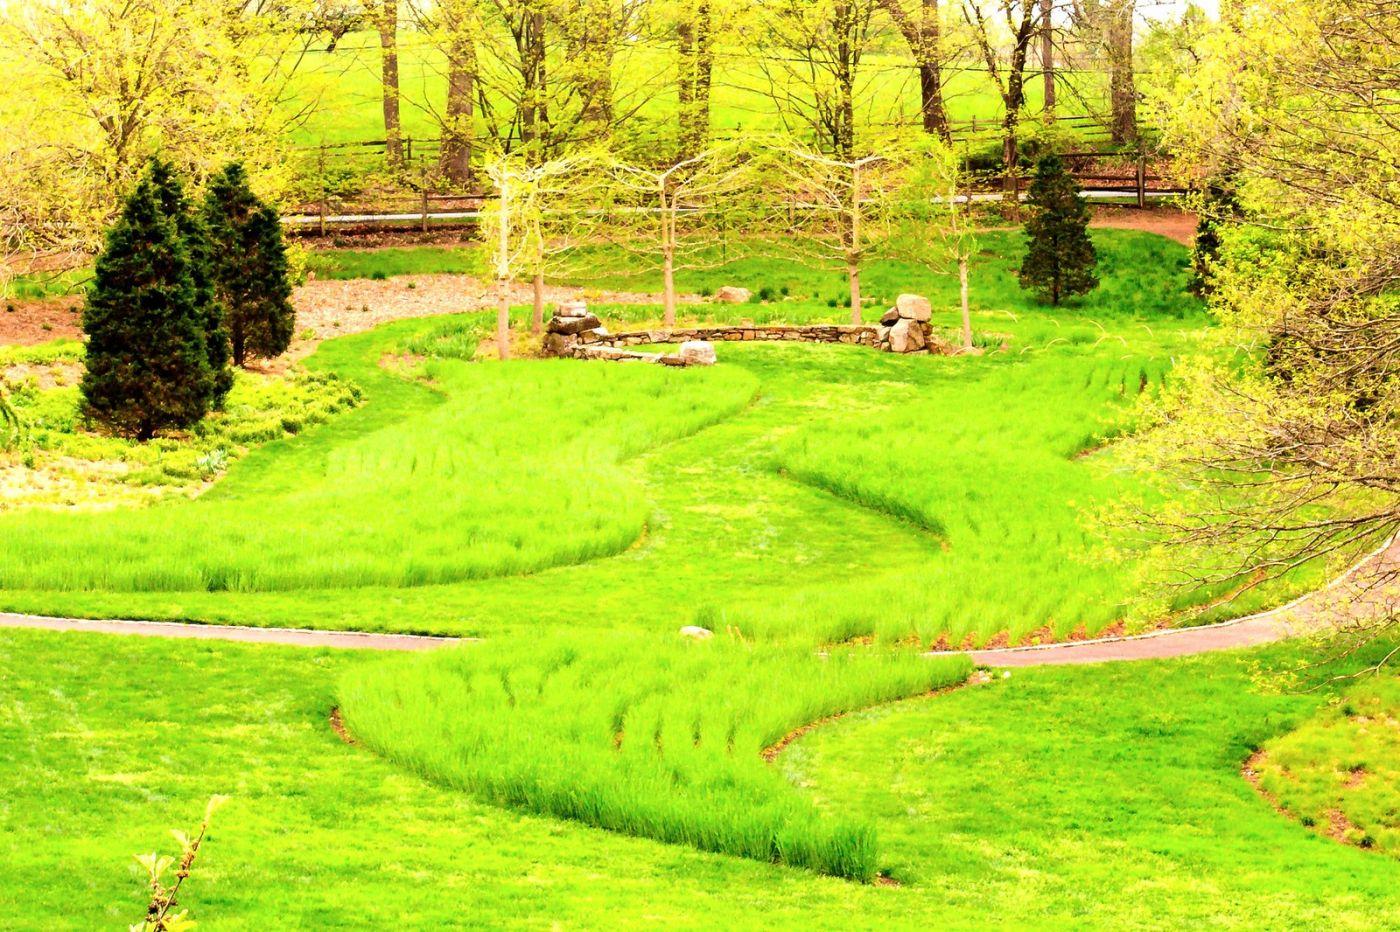 Chanticleer花园,融入自然_图1-10